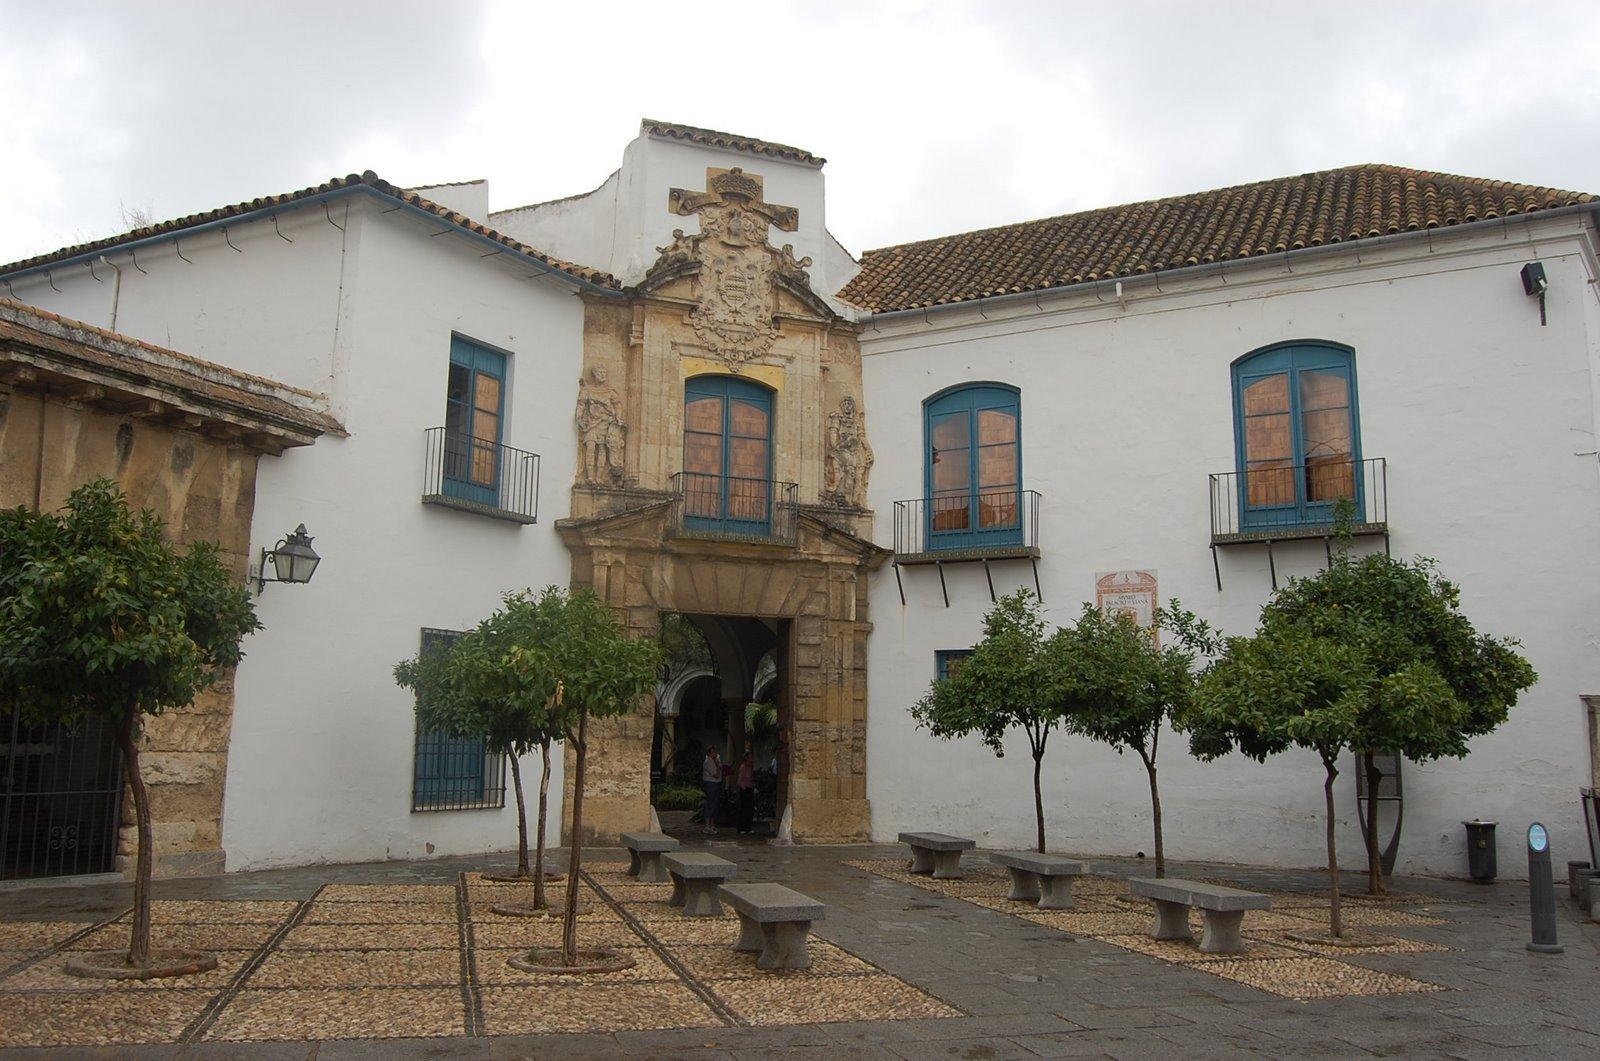 The Palacio Museo de Viana of Córdoba, Spain